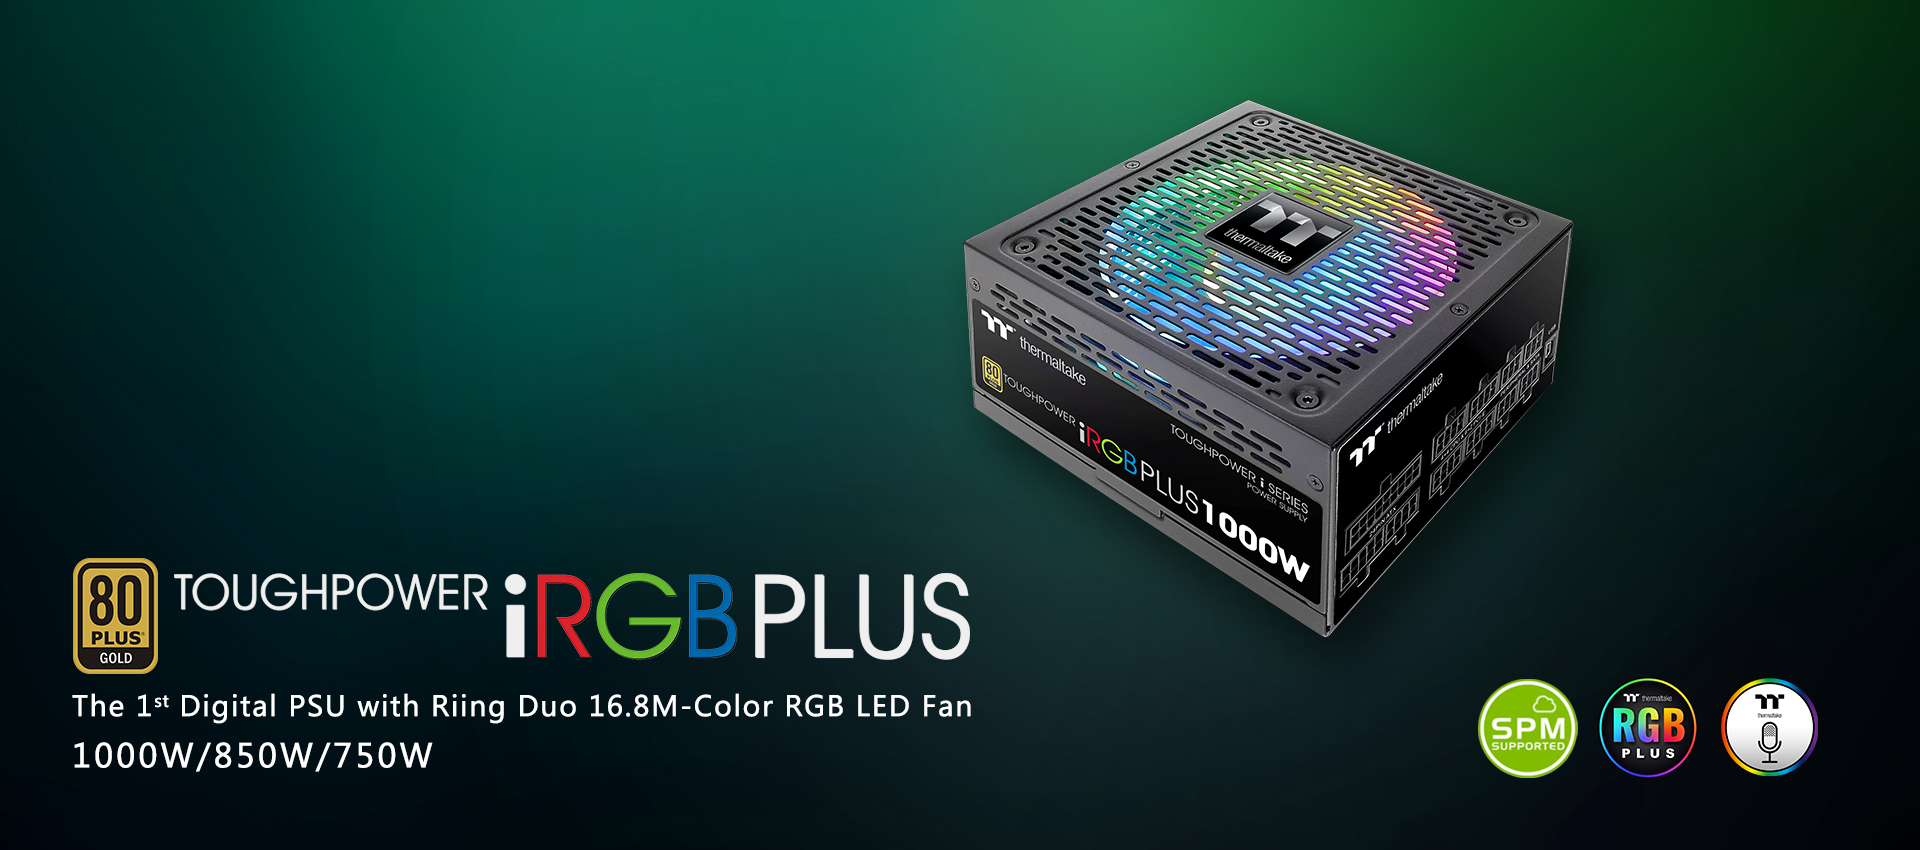 Toughpower iRGB PLUS 1000W Gold